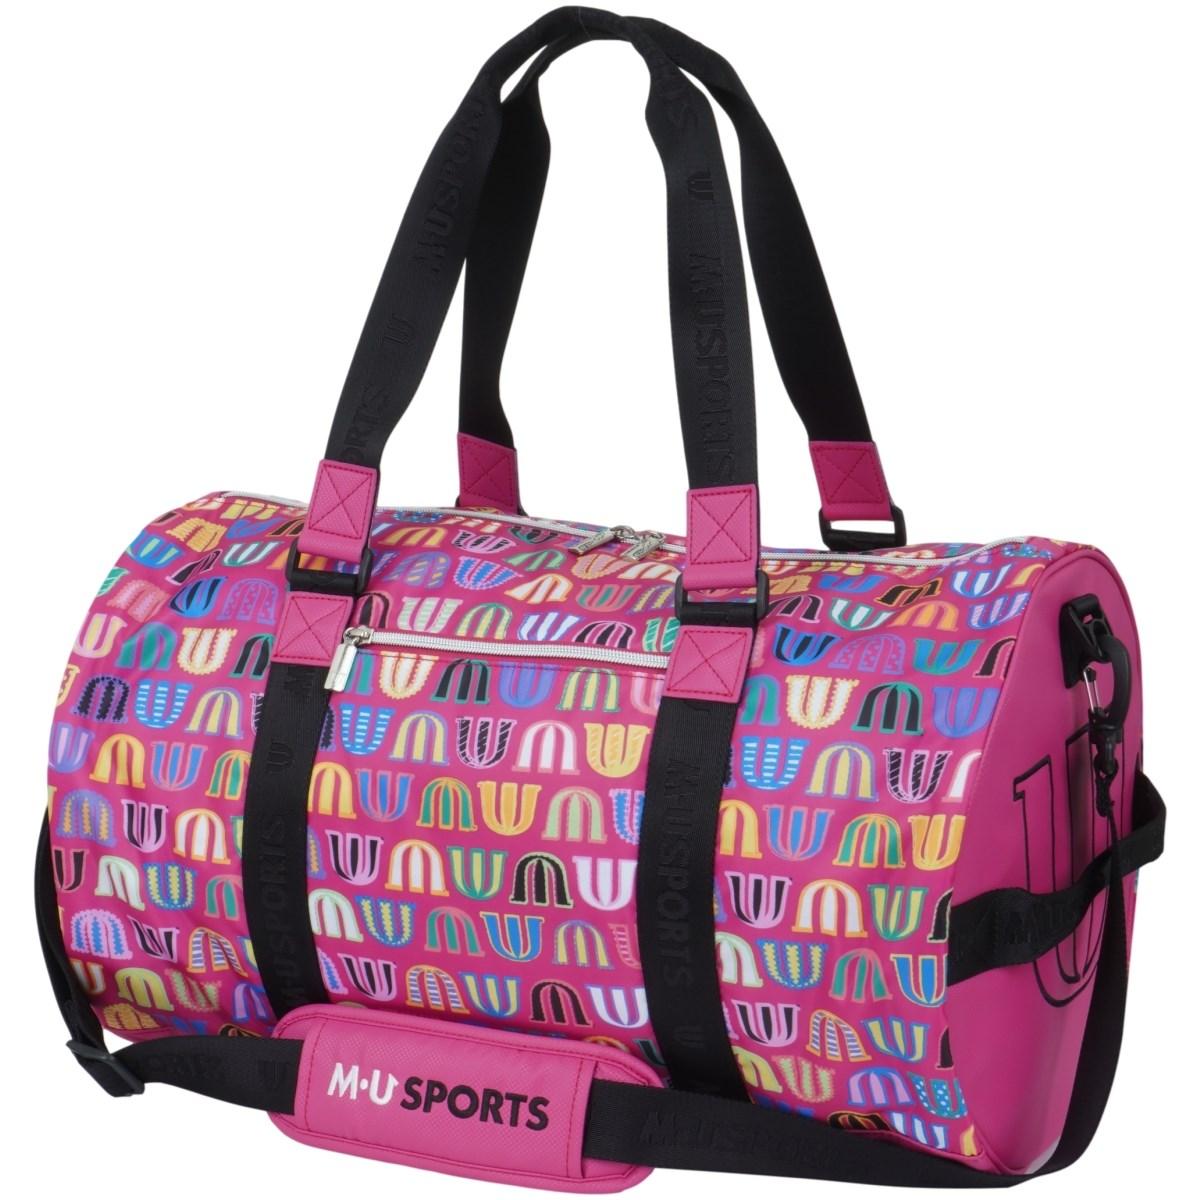 MUスポーツ M.U SPORTS ロゴ総柄ボストンバッグ ピンク